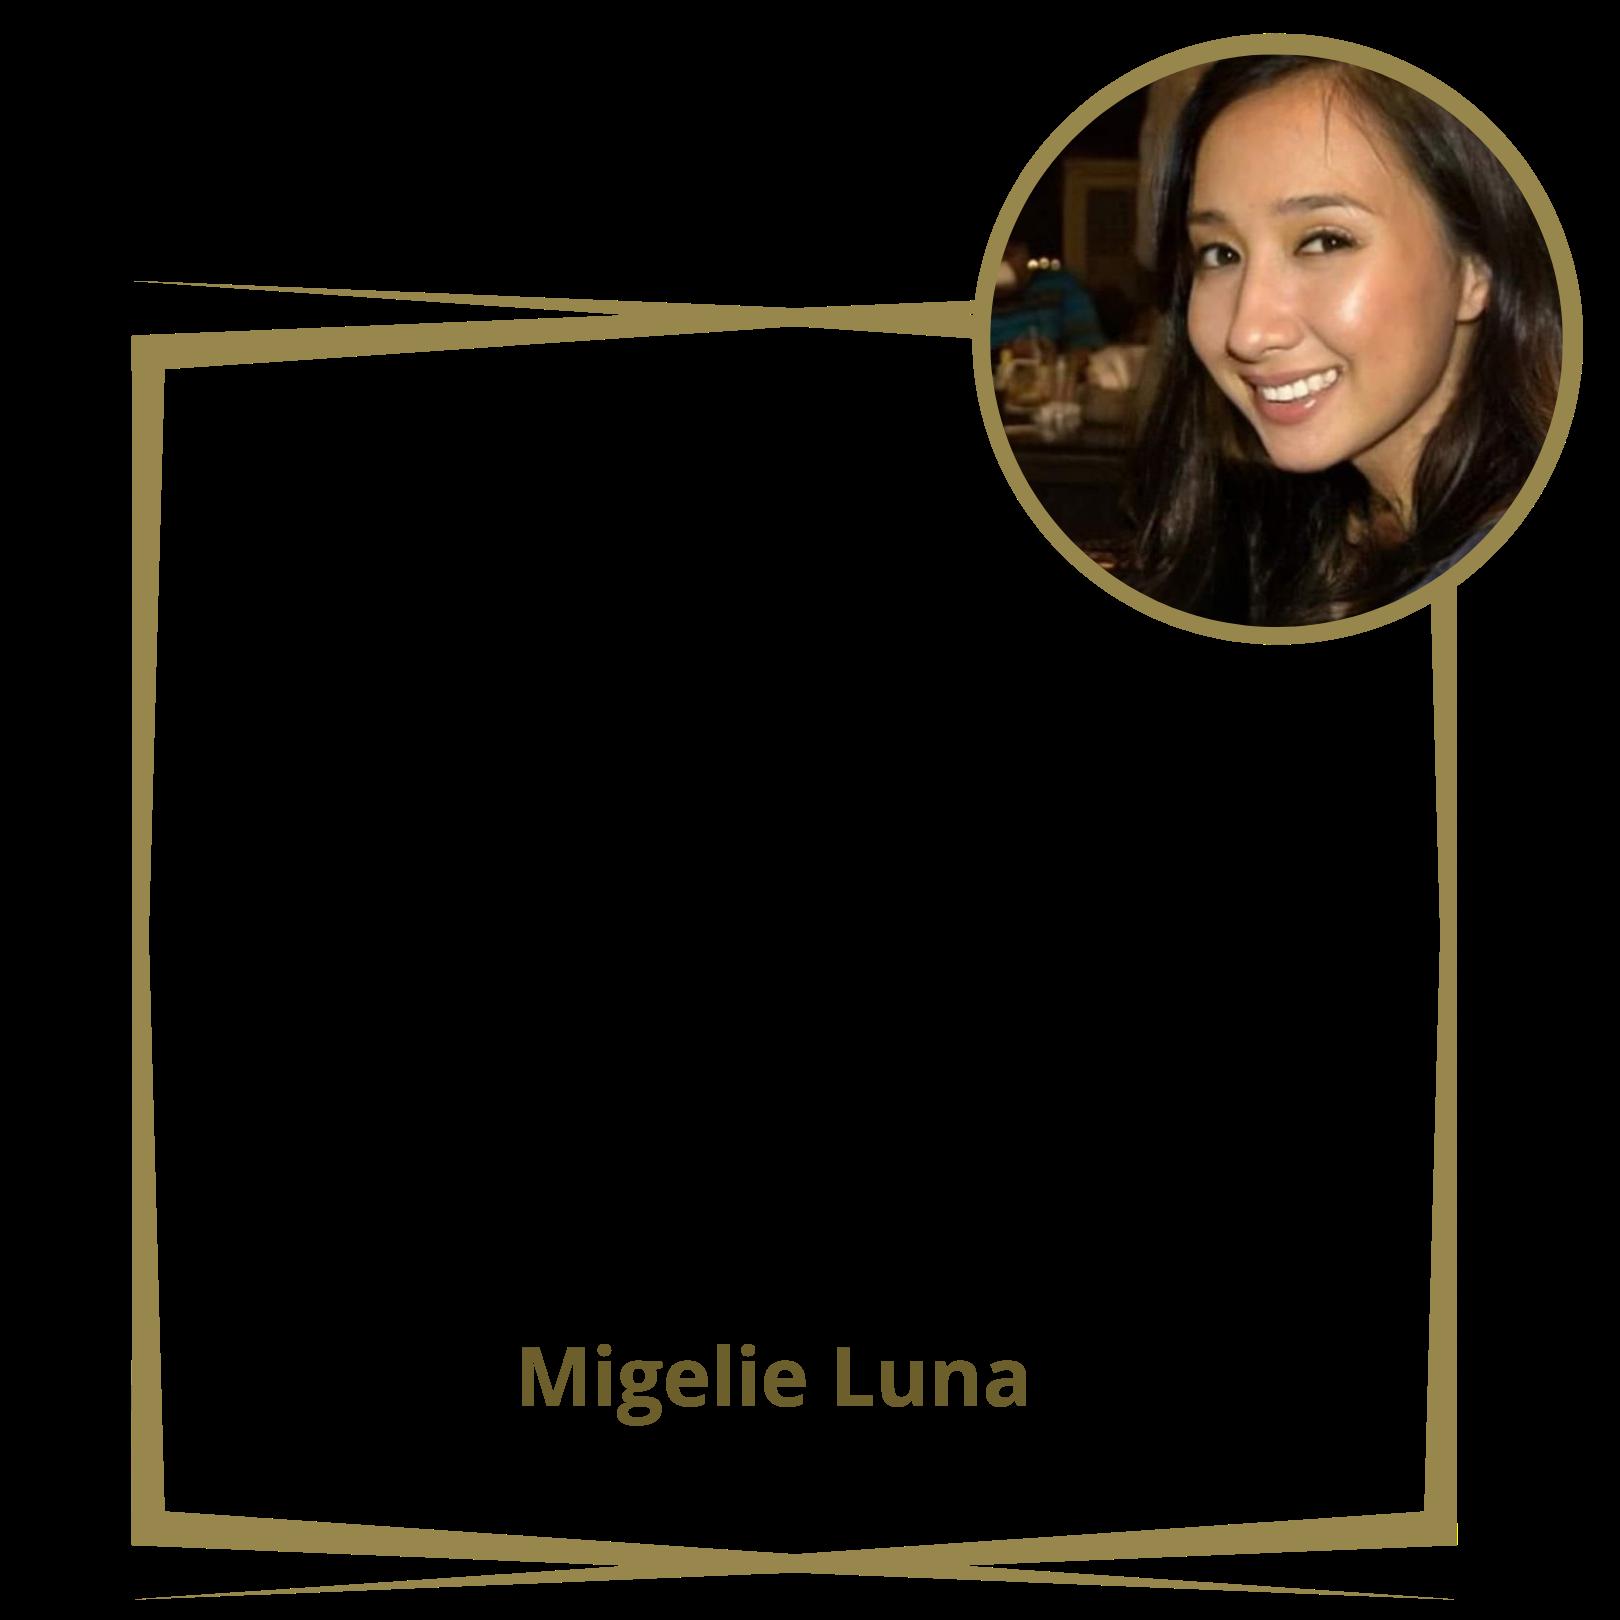 4 - Migelie Luna